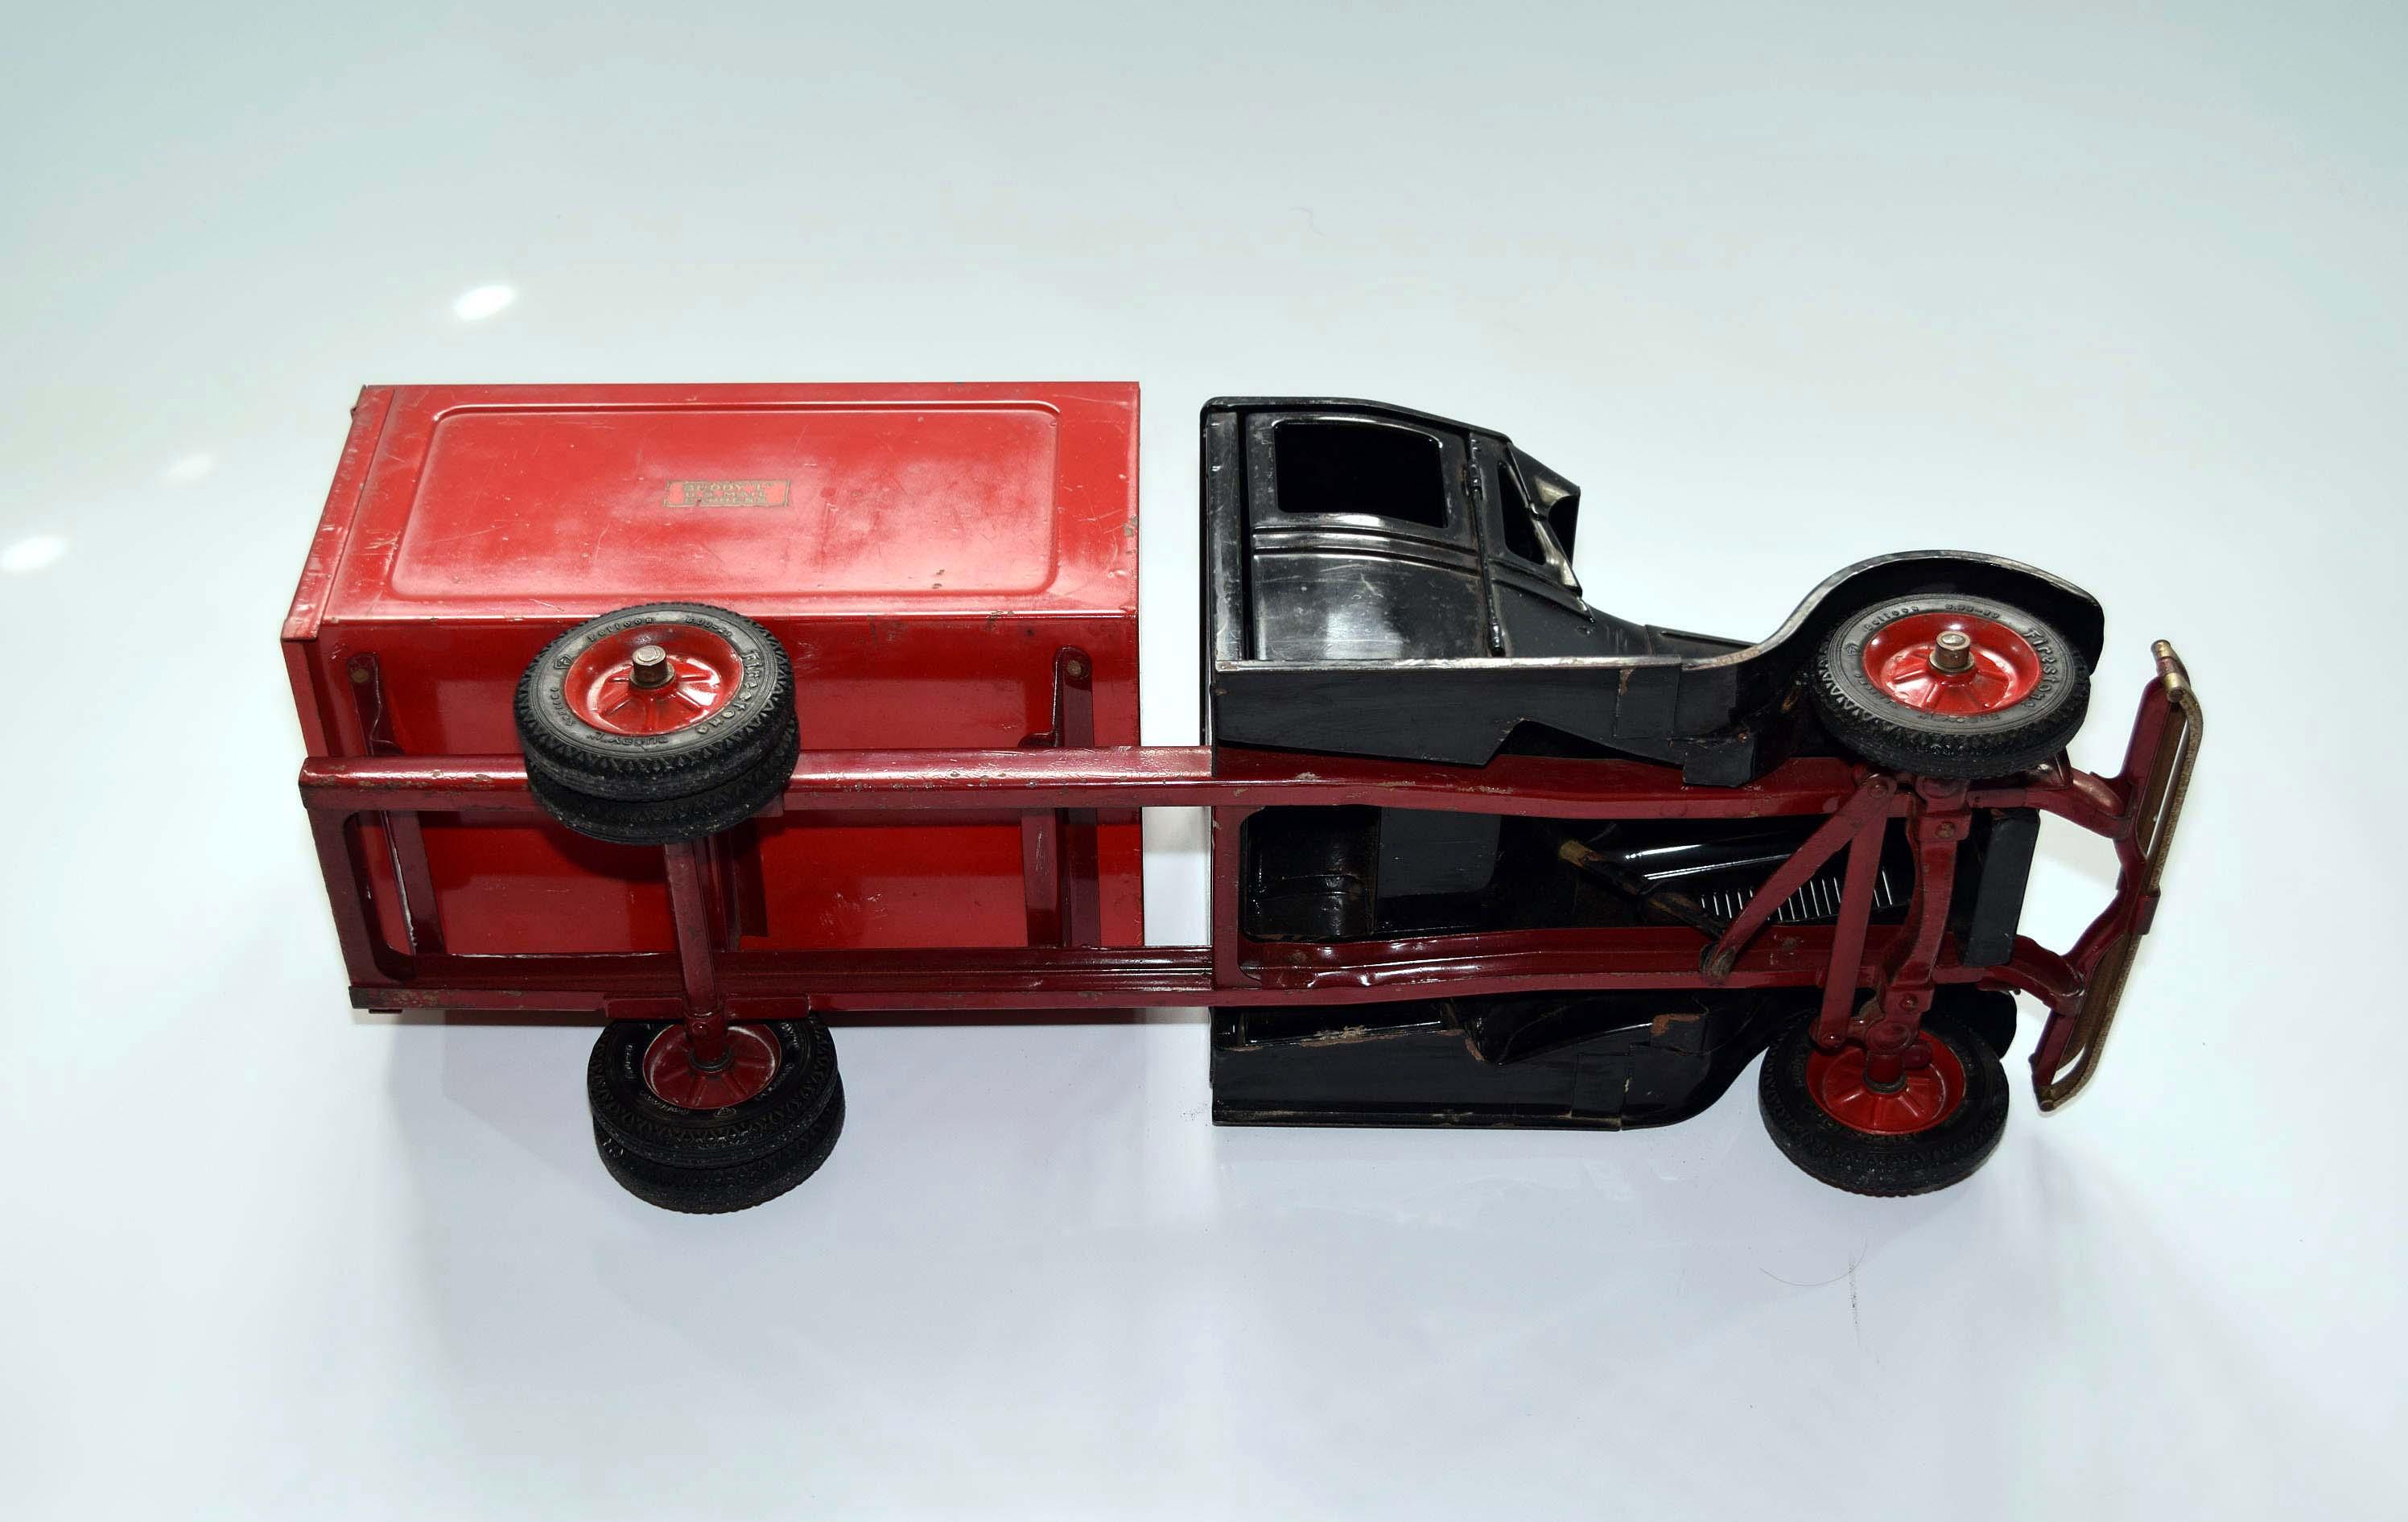 Antique Buddy L Junior Trucks For Sale